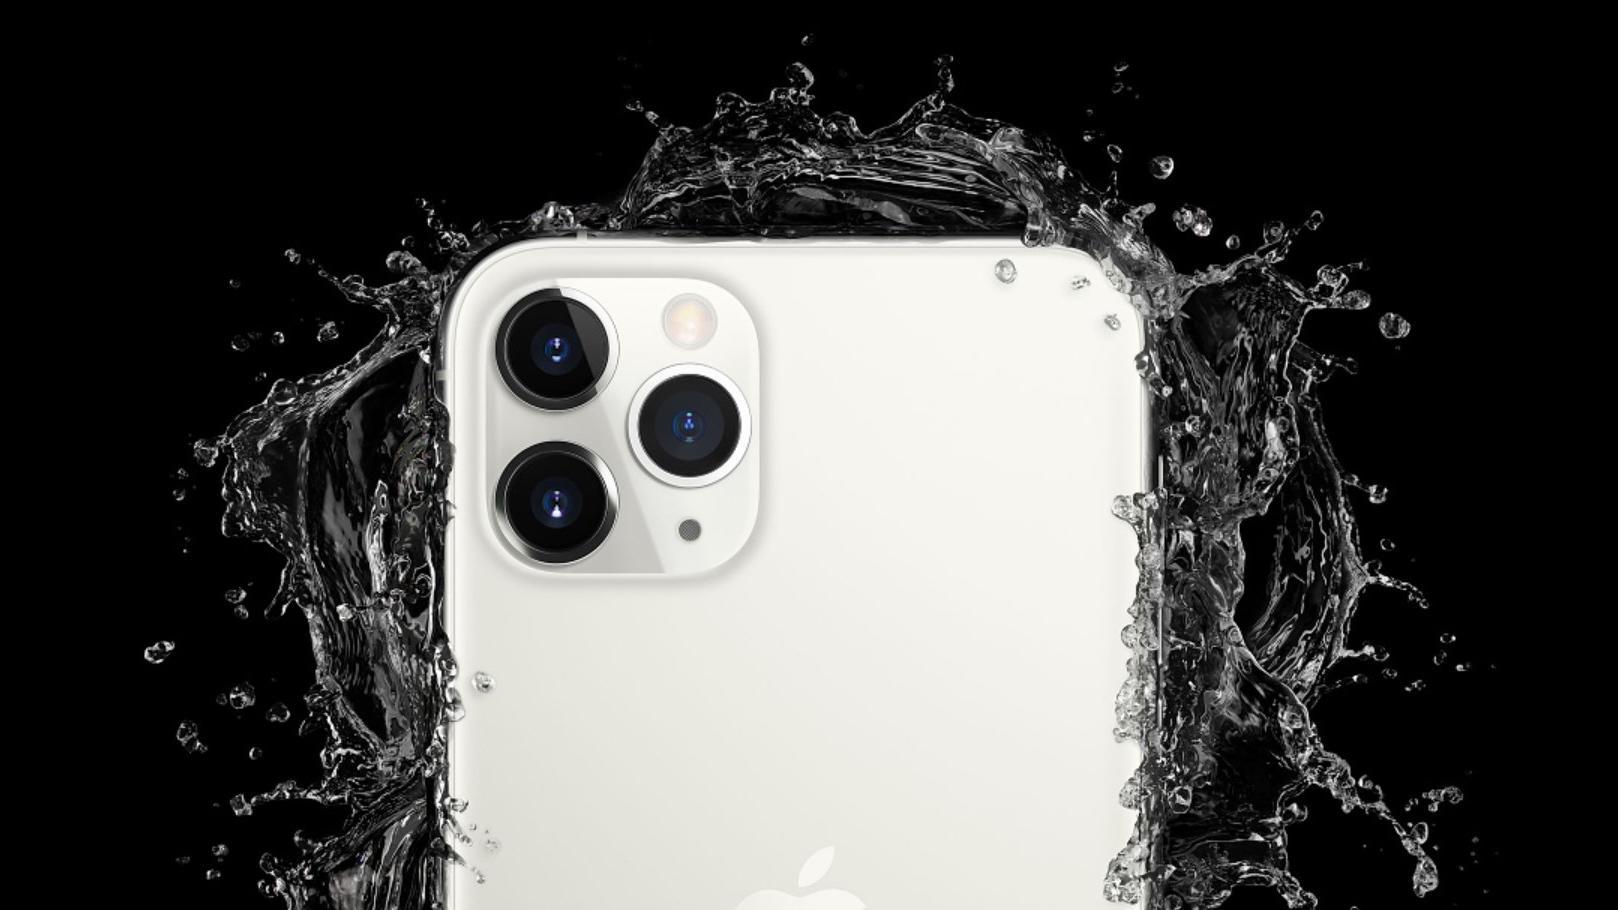 iPhone 11 Pro Max mit unlimitiertem Datenvolumen.